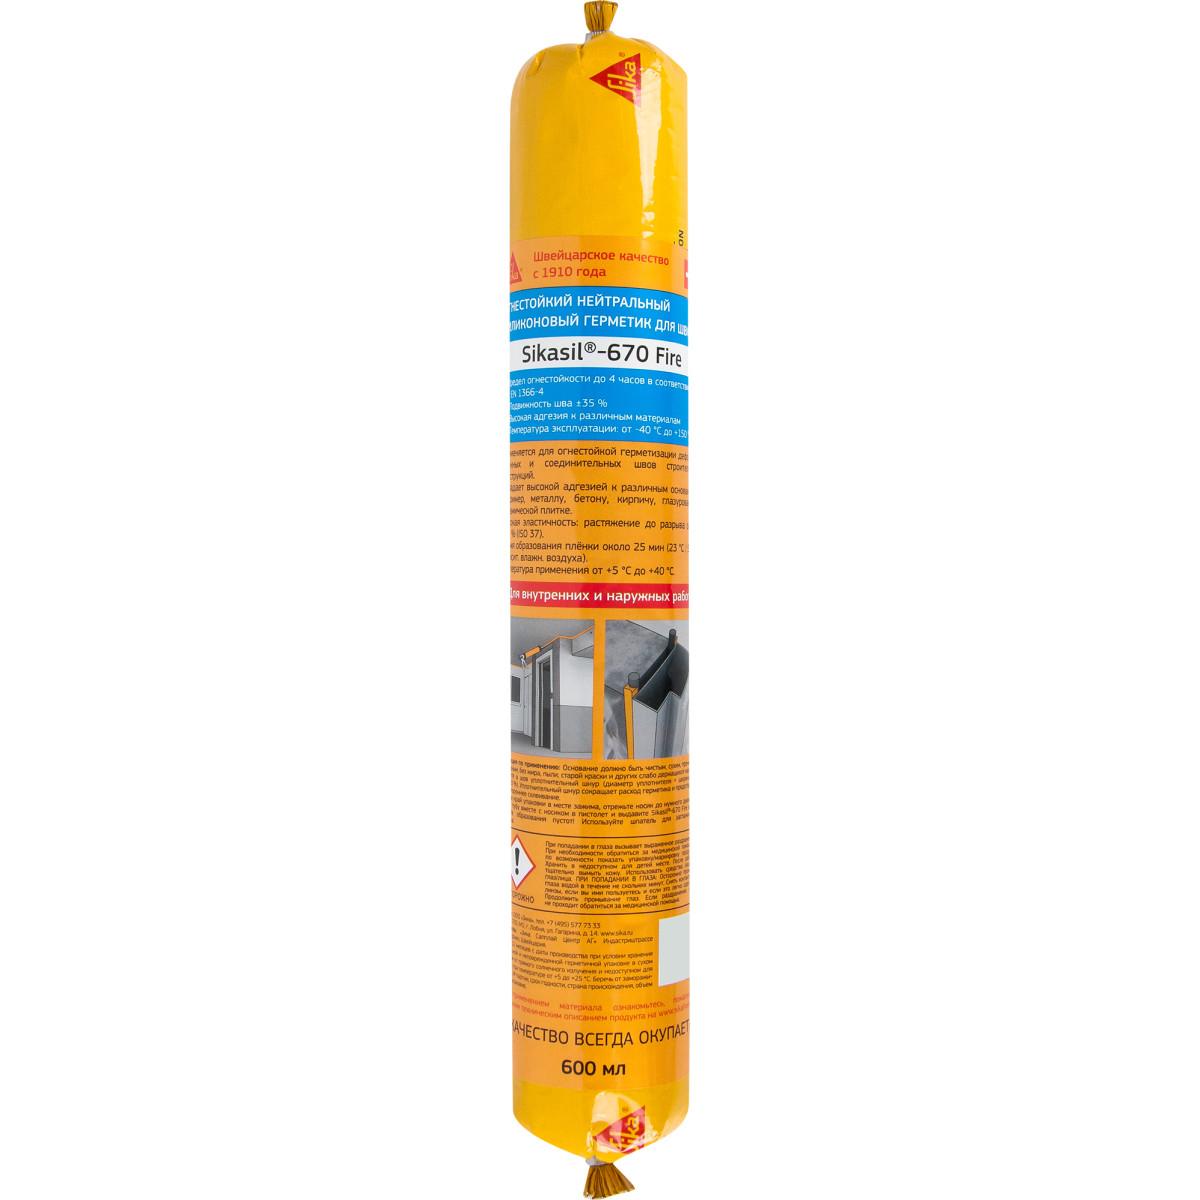 Герметик противопожарный Sika Sikasil-670 fire 600 мл цвет белый